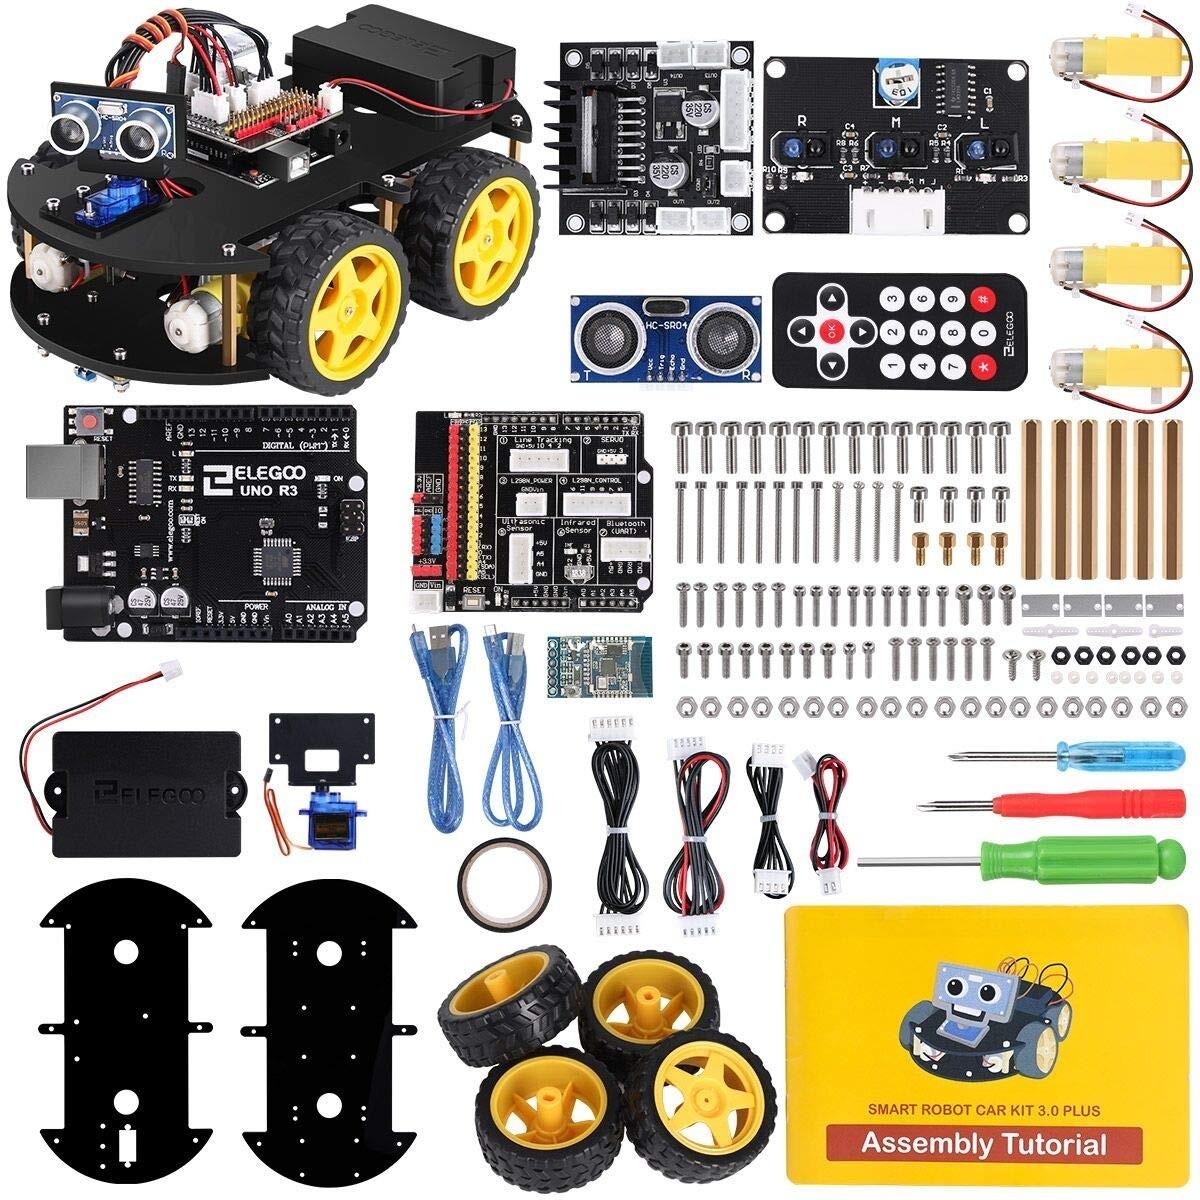 ELEGOO UNO R3 Project Smart Robot Car Kit V3.0 (Open Box)